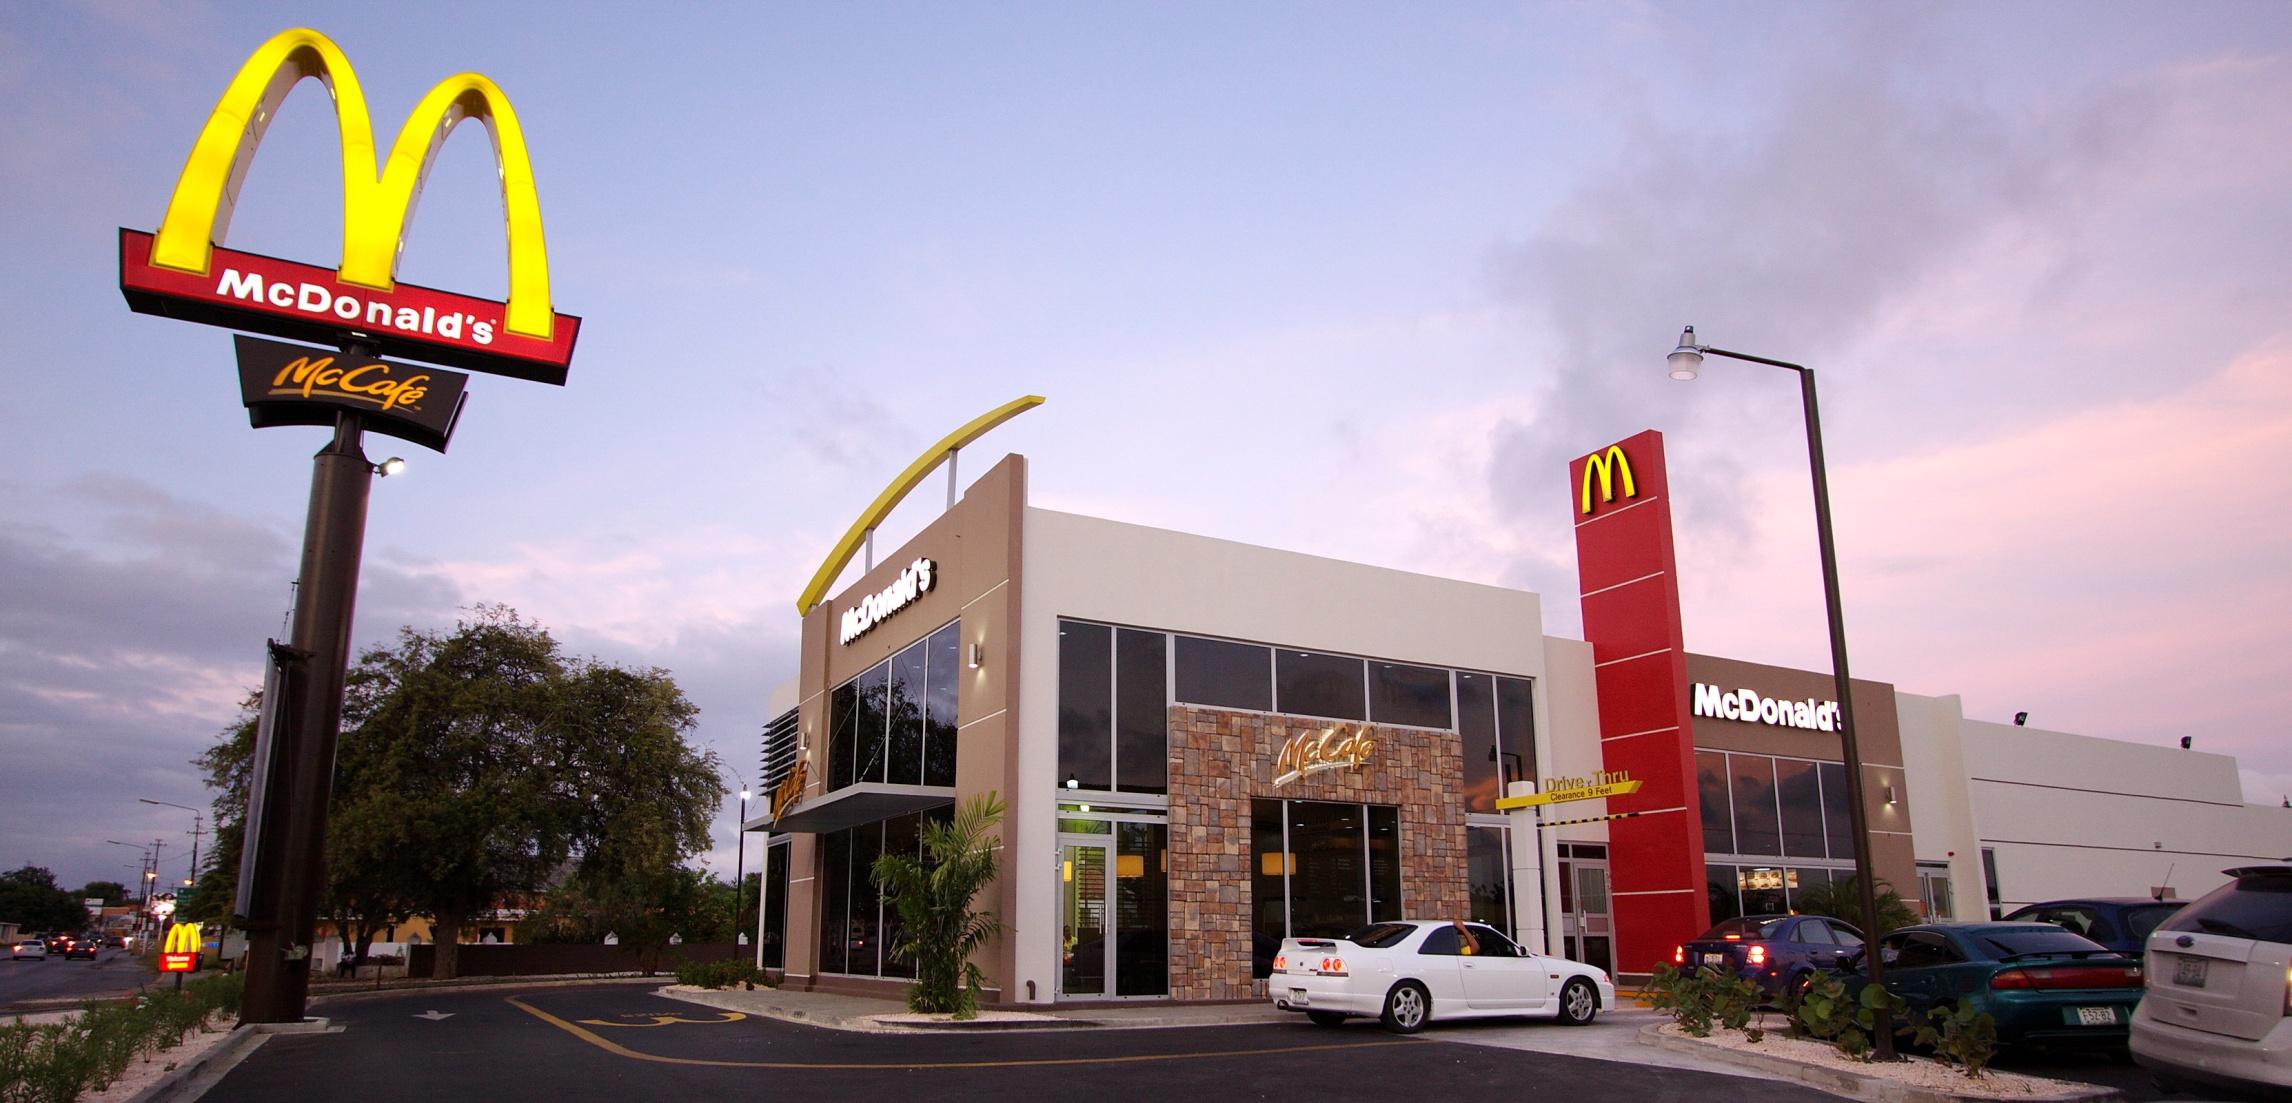 A McDonald's in Curacao